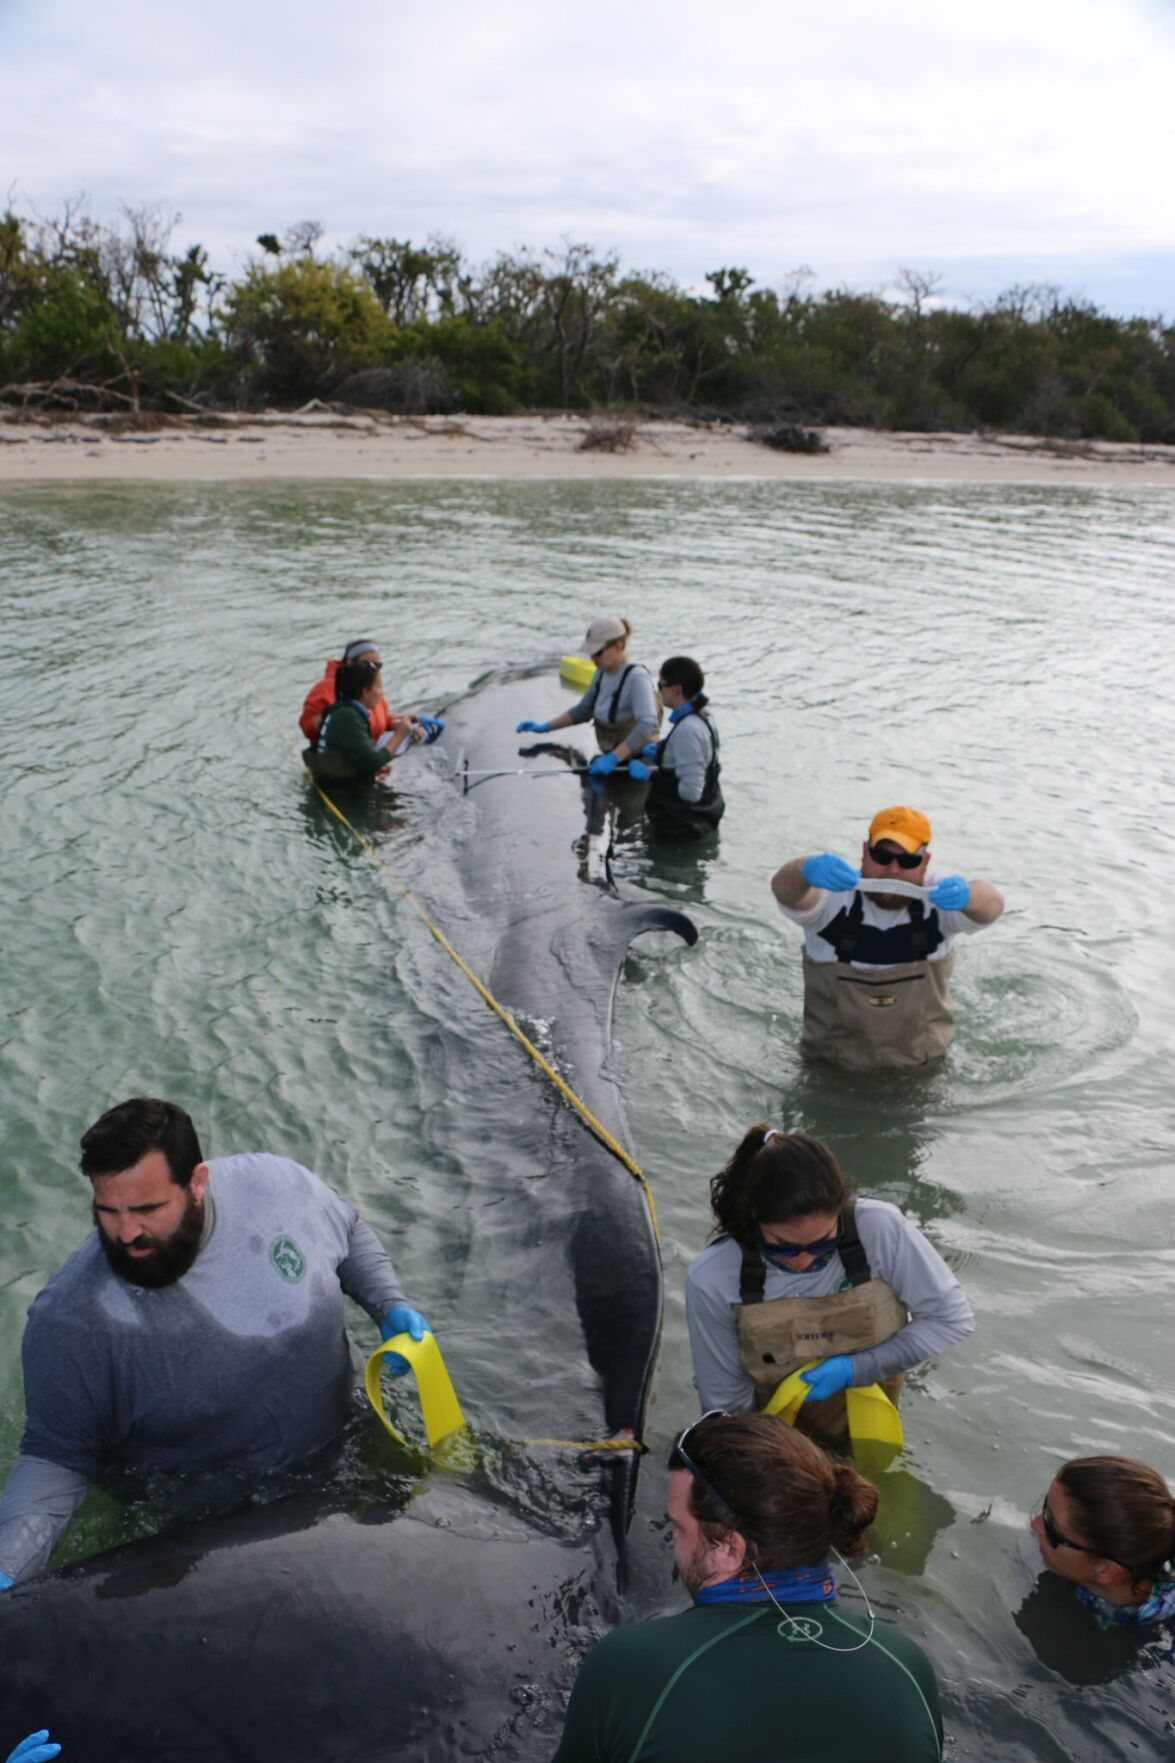 Rice's whale with wildlife responders